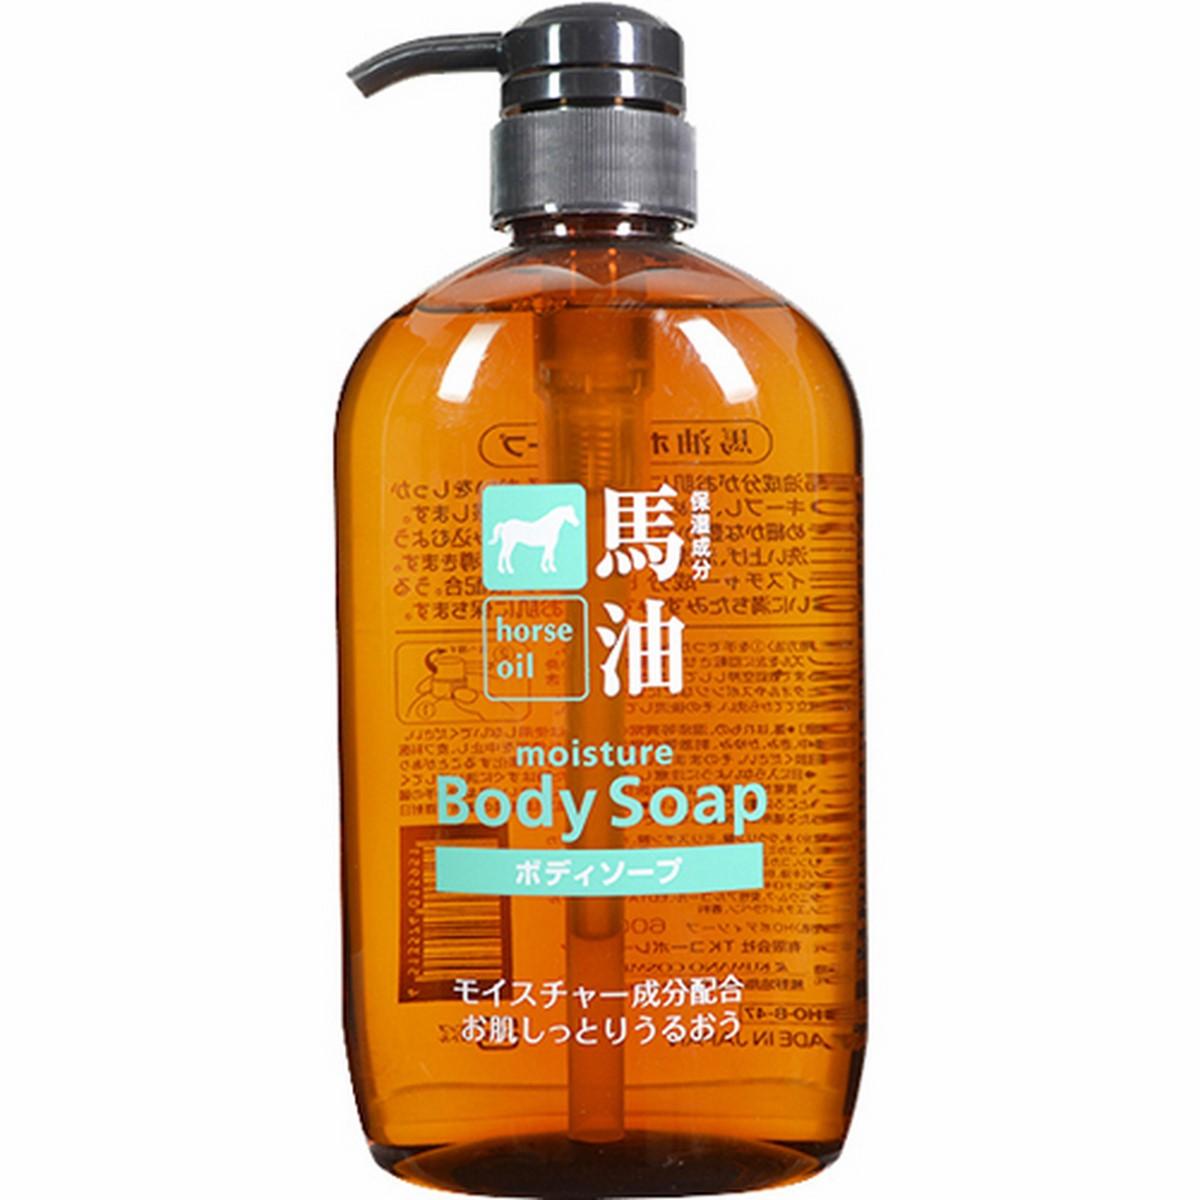 Sữa tắm tinh chất mỡ ngựa Nhật Bản Horse Oil Moisture Body Soap 600ml